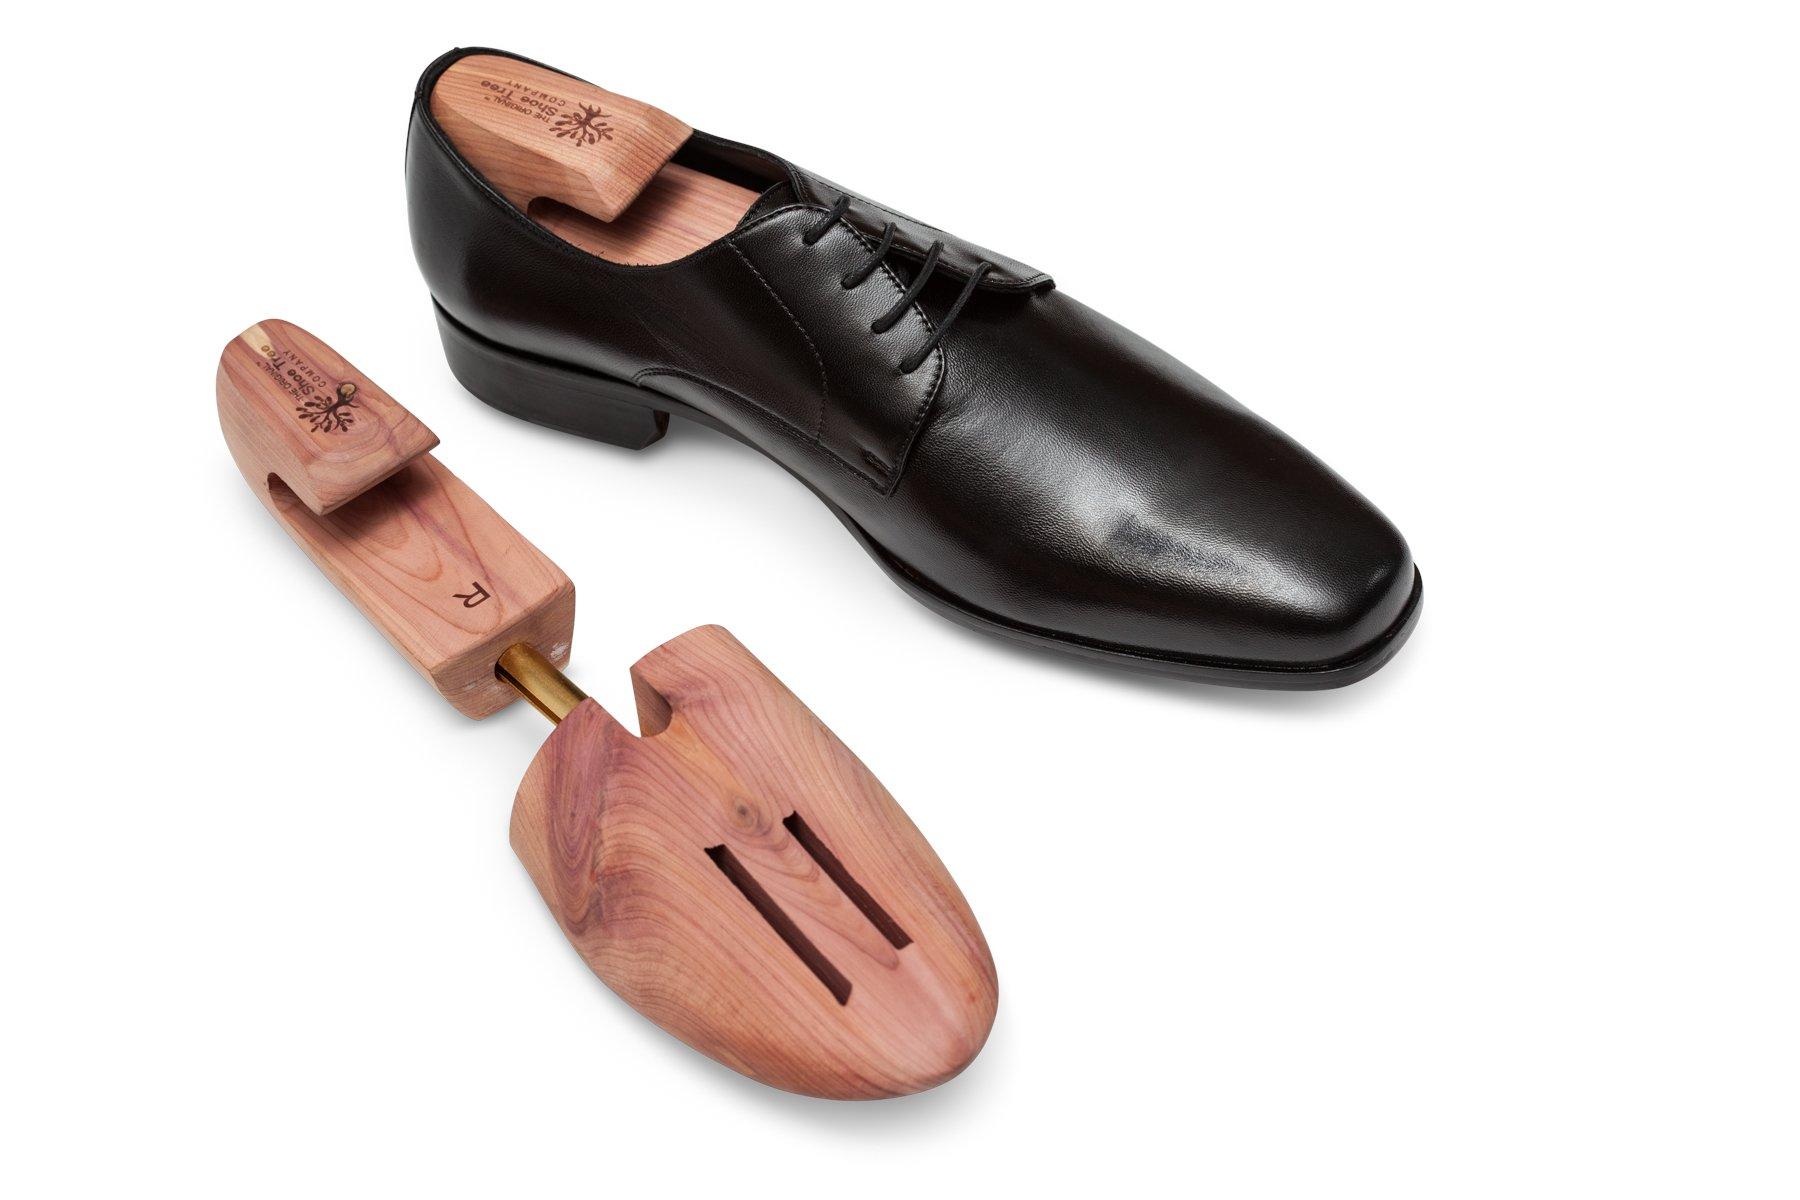 The Original Shoe Tree Company Cedar Shoe Tree M by The Original Shoe Tree Company (Image #4)